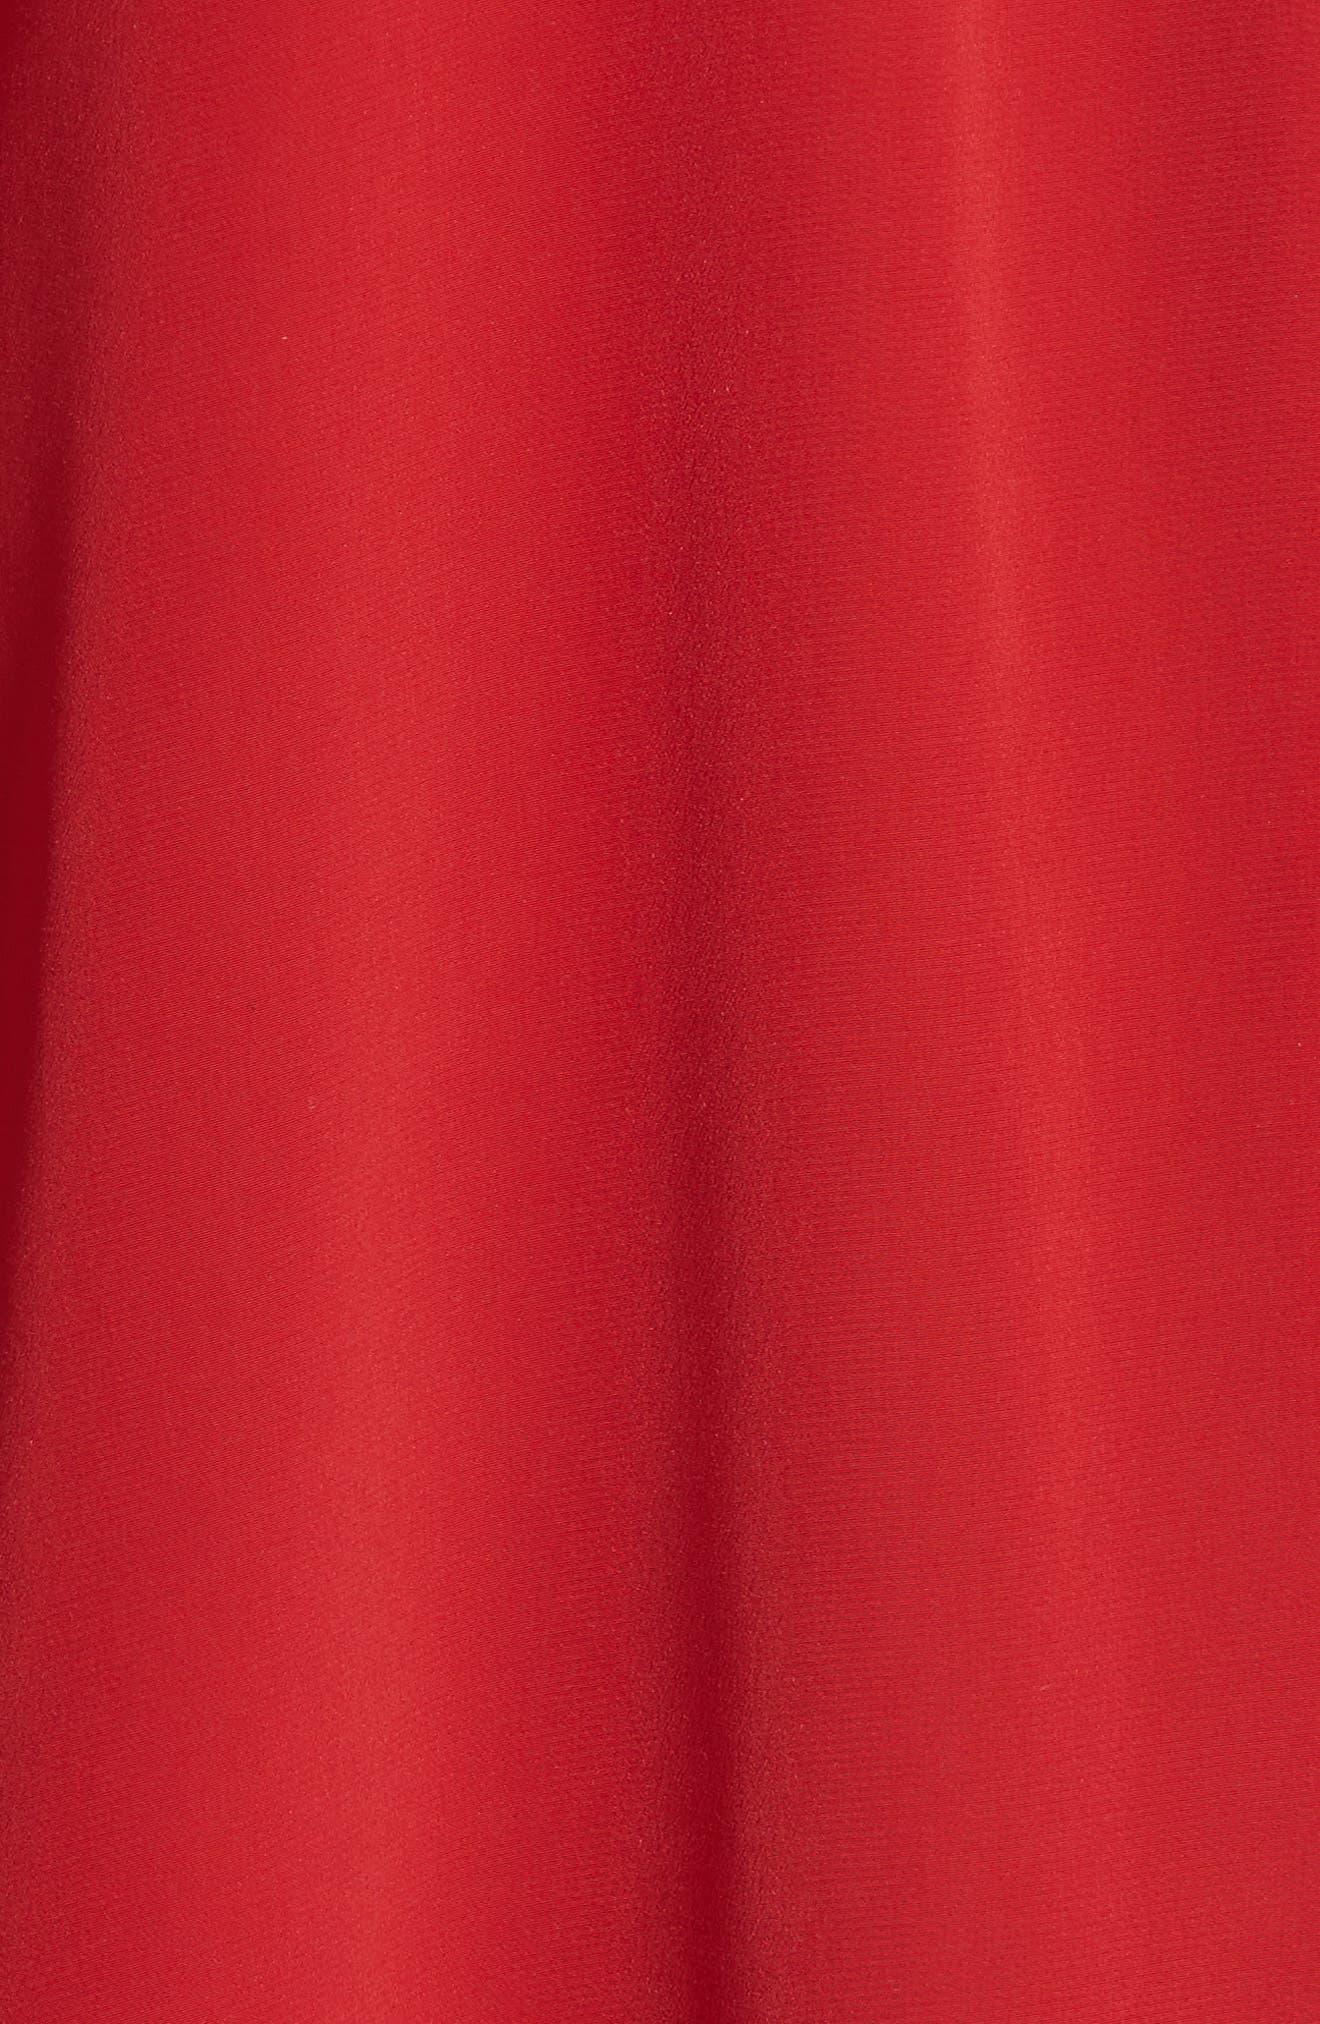 Kimono Sleeve Blouse,                             Alternate thumbnail 6, color,                             Red